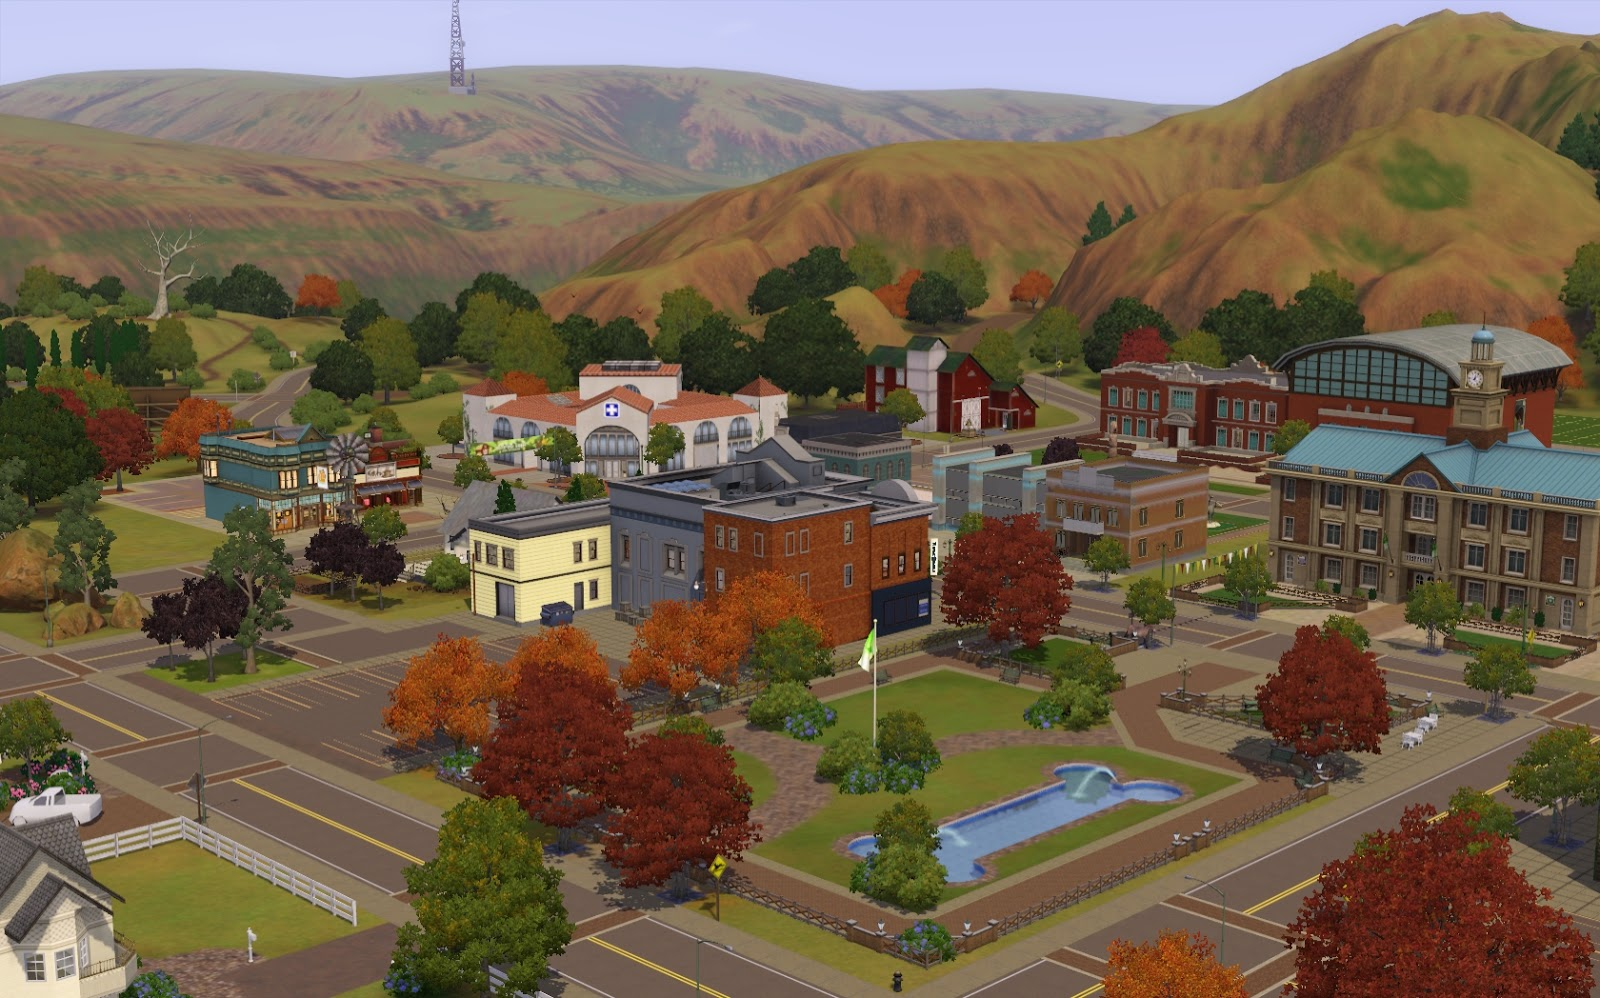 Summer's Little Sims 3 Garden: Appaloosa Plains (The Sims 3